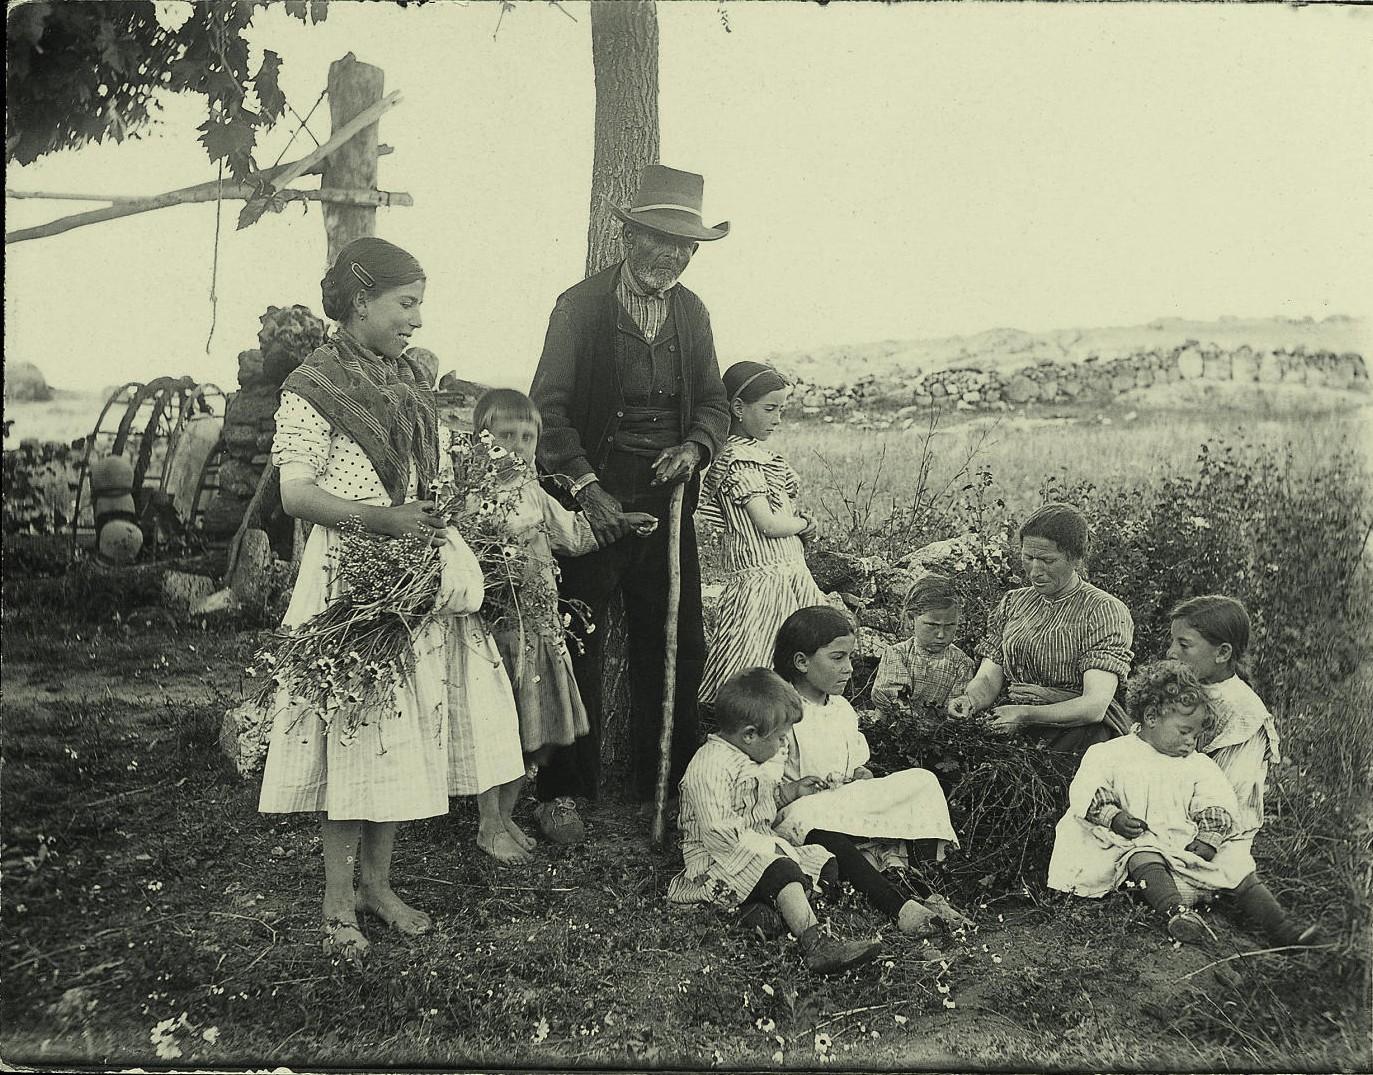 b.- Un grupo de gente recolectando flores de malva